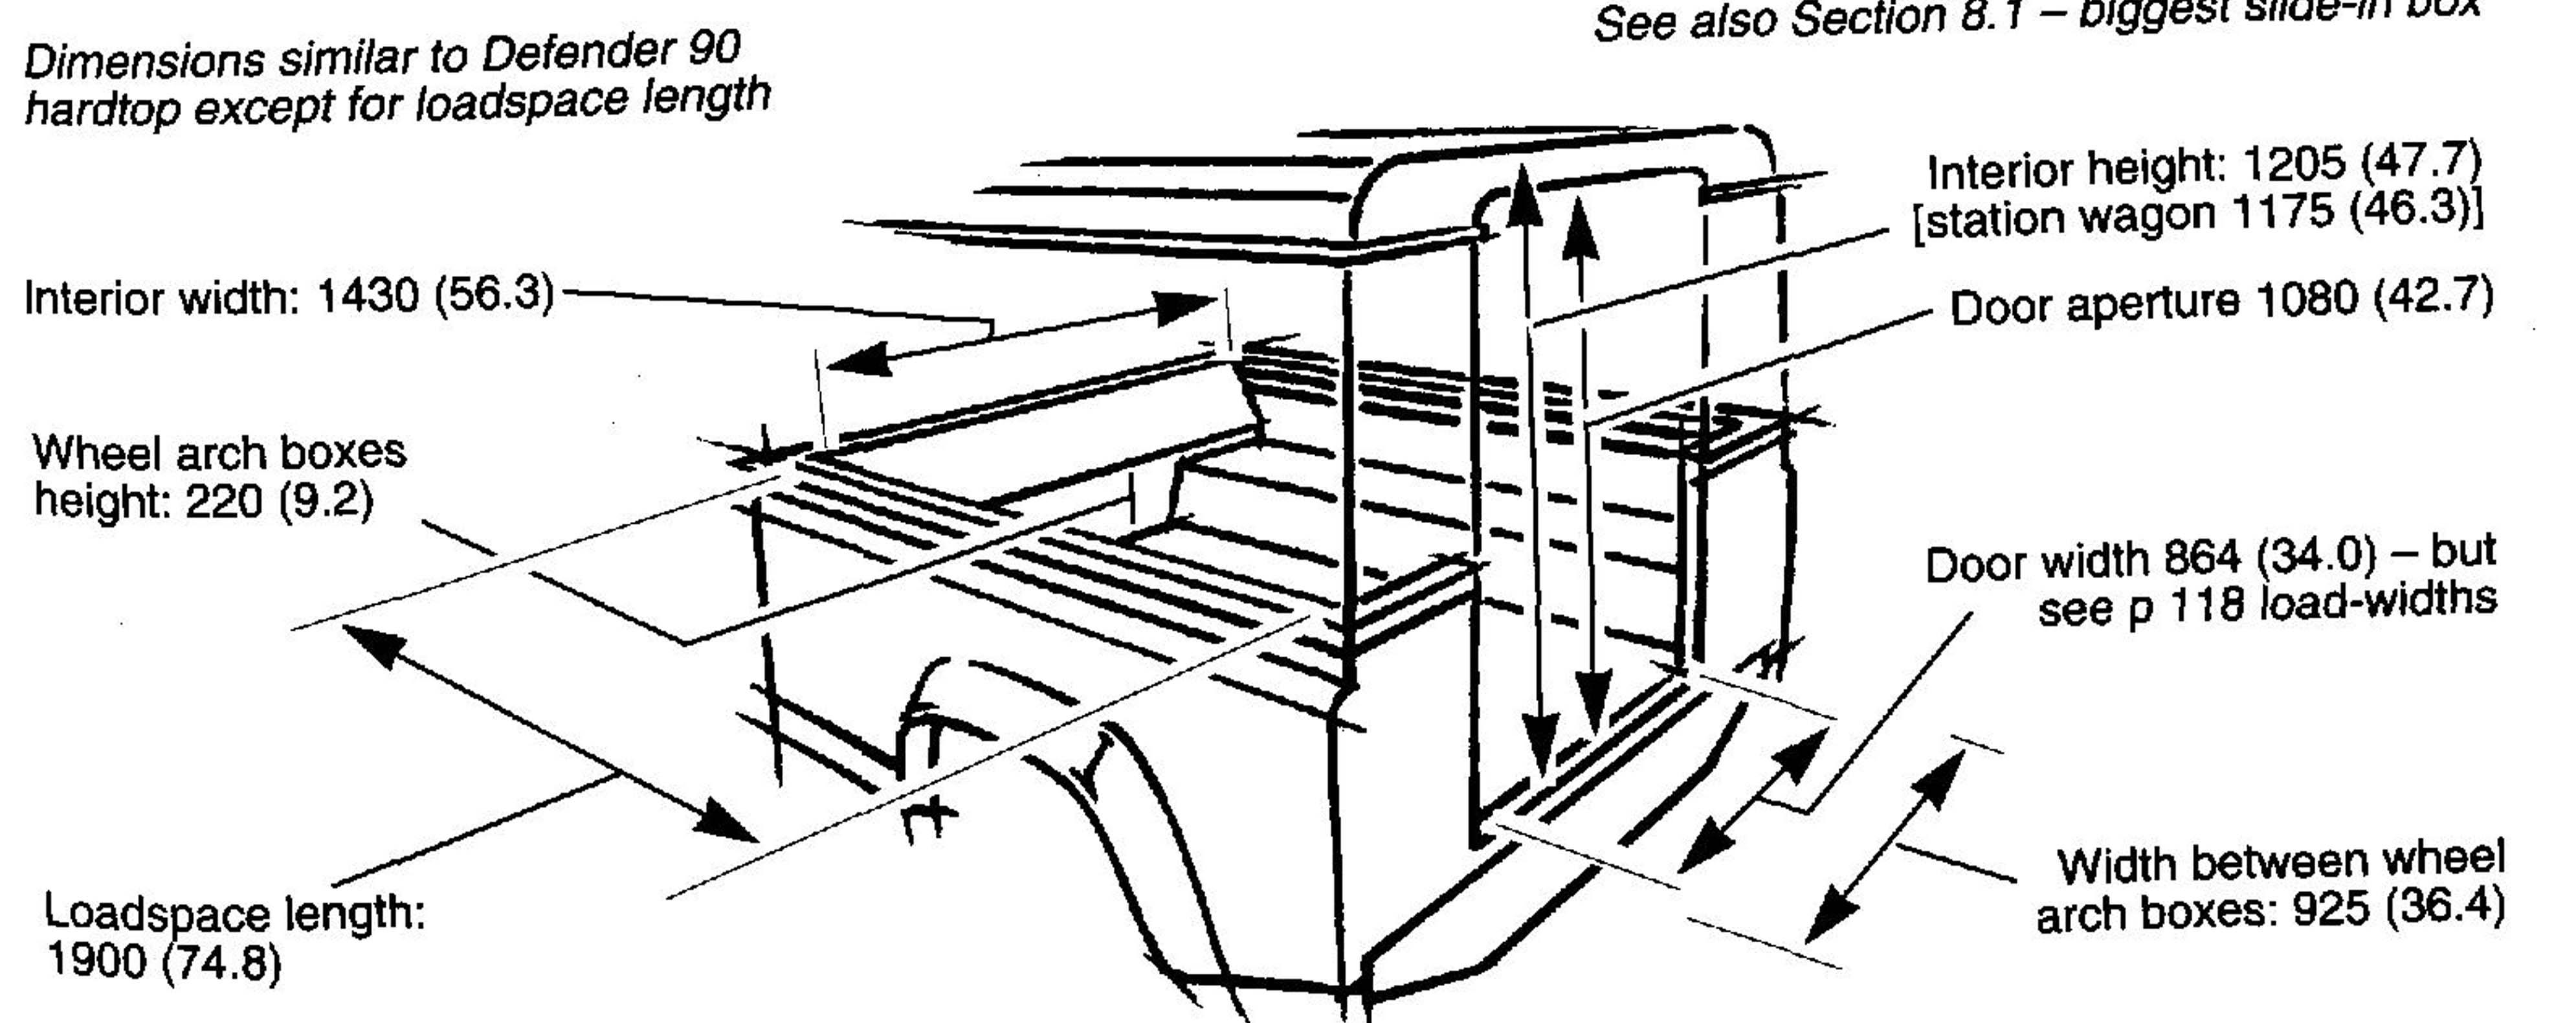 land rover defender 90 interior dimensions